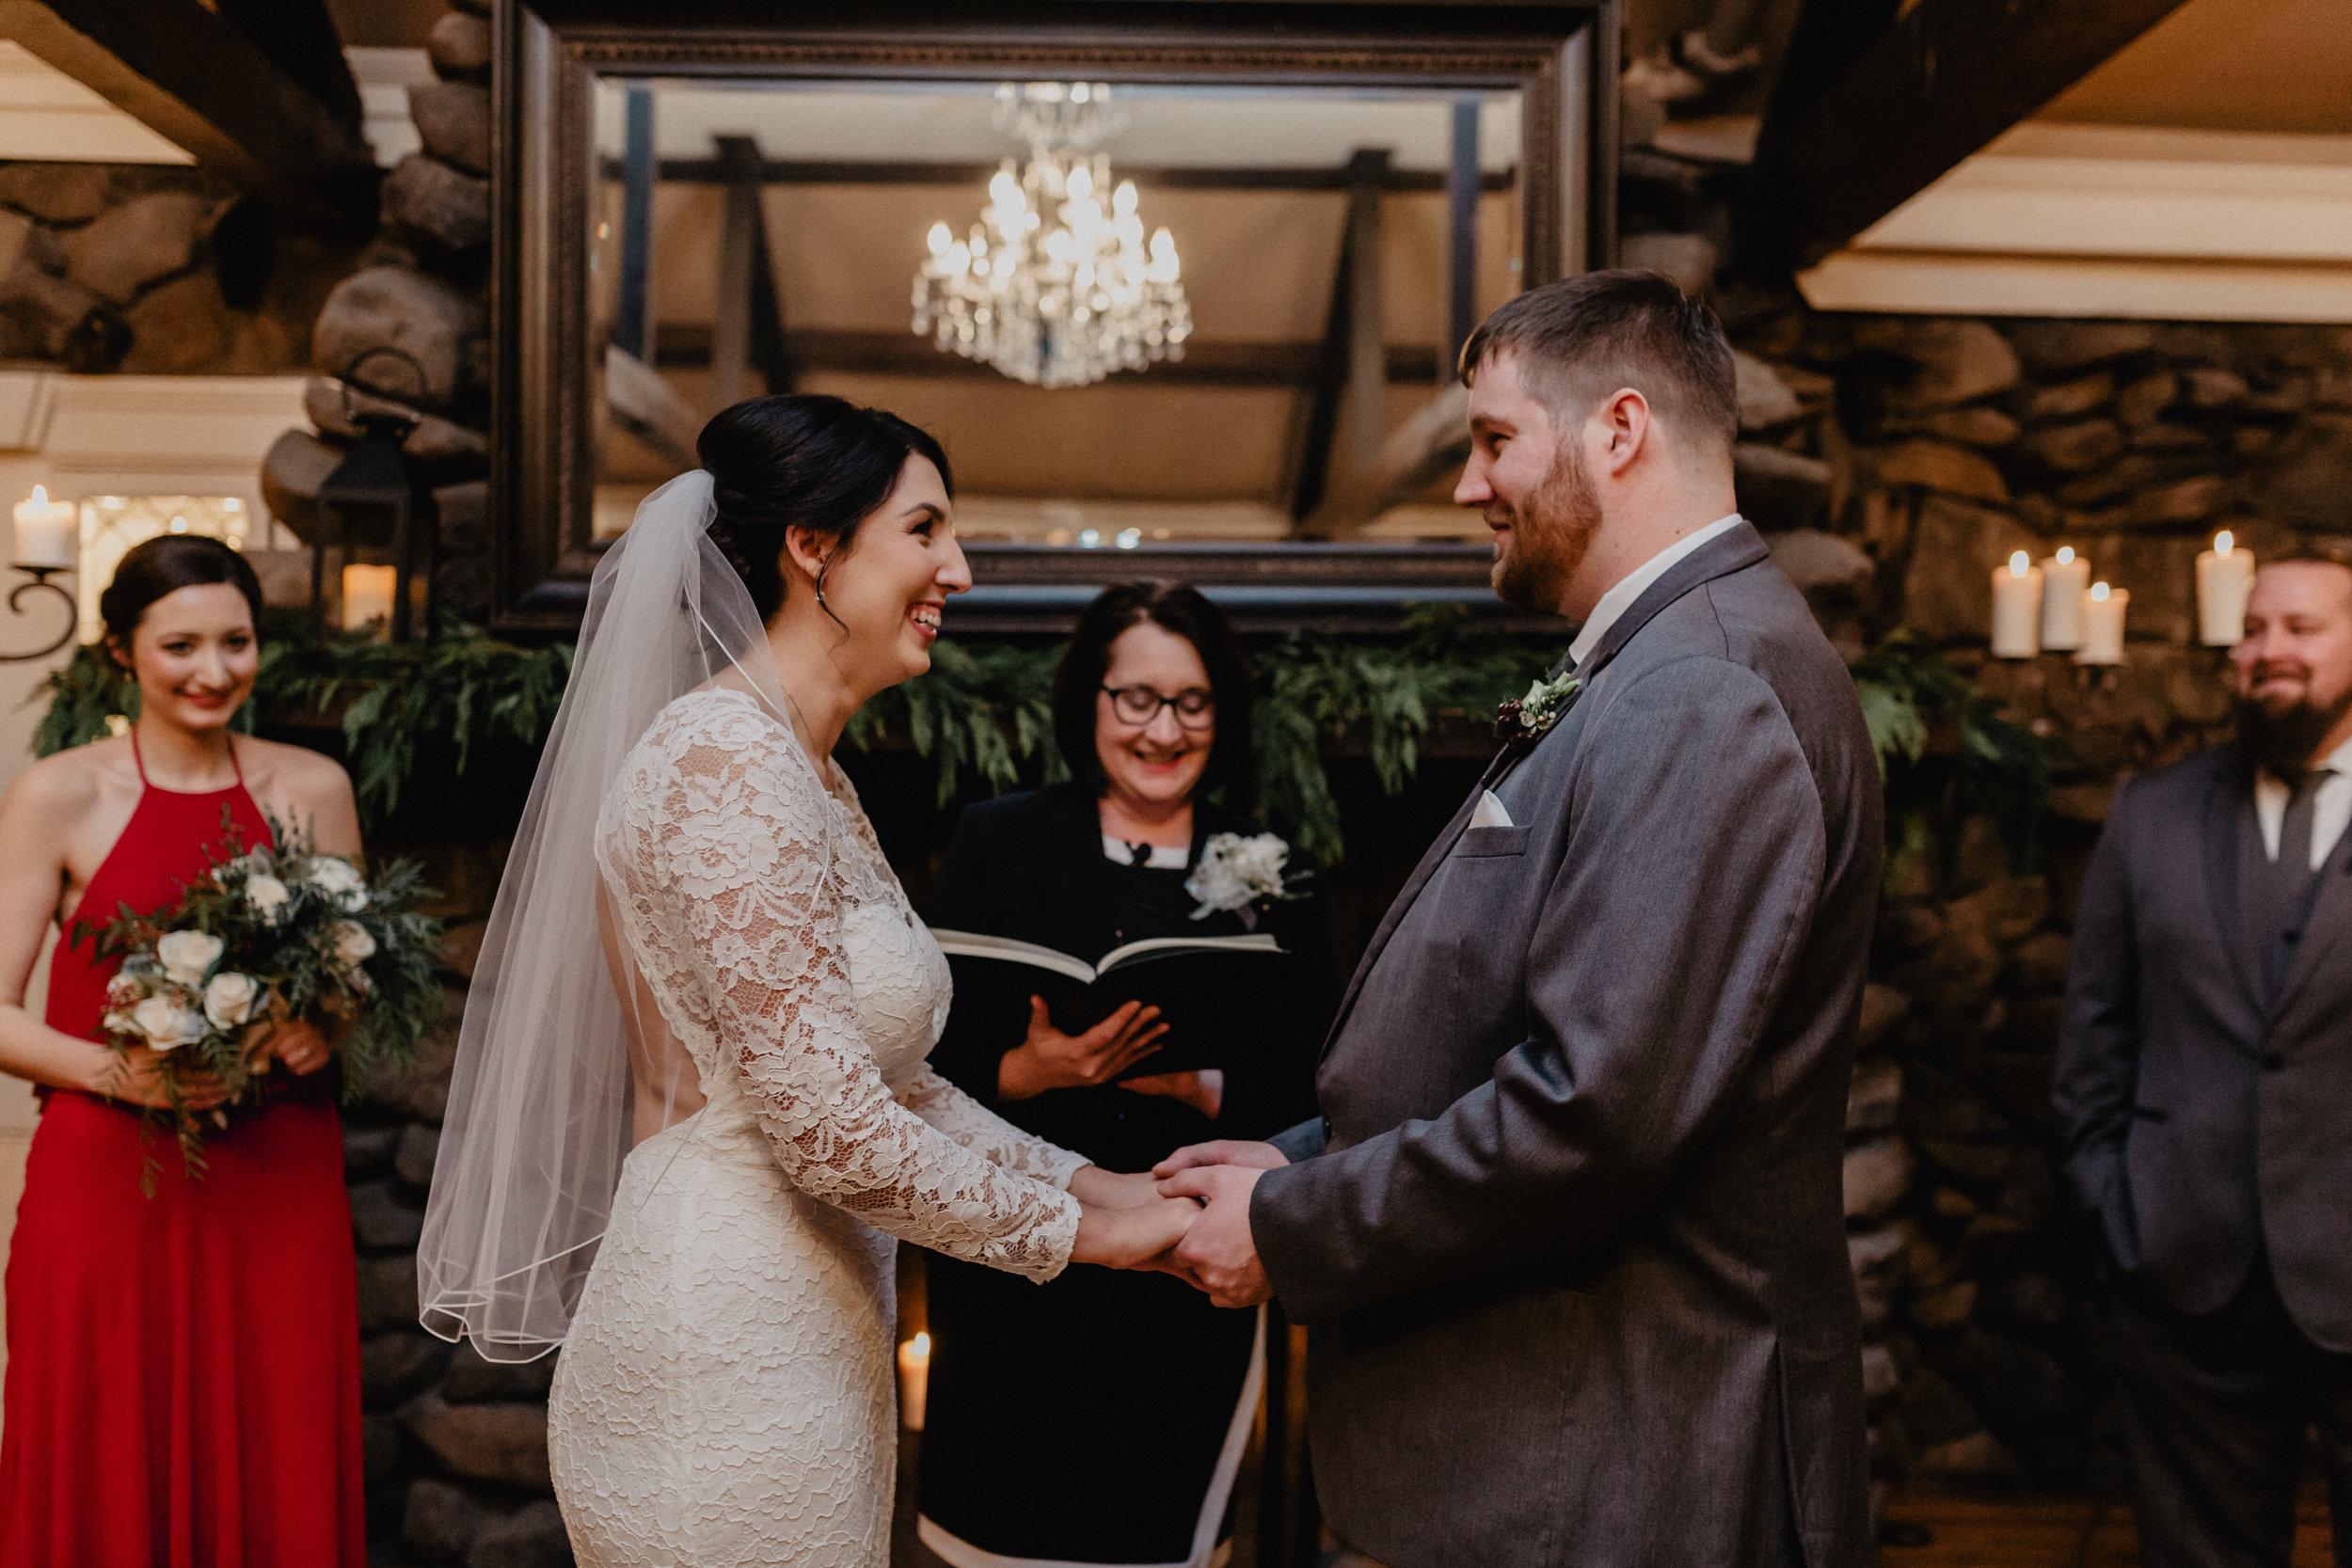 old_daley_on_crooked_lake_wedding_051.jpg